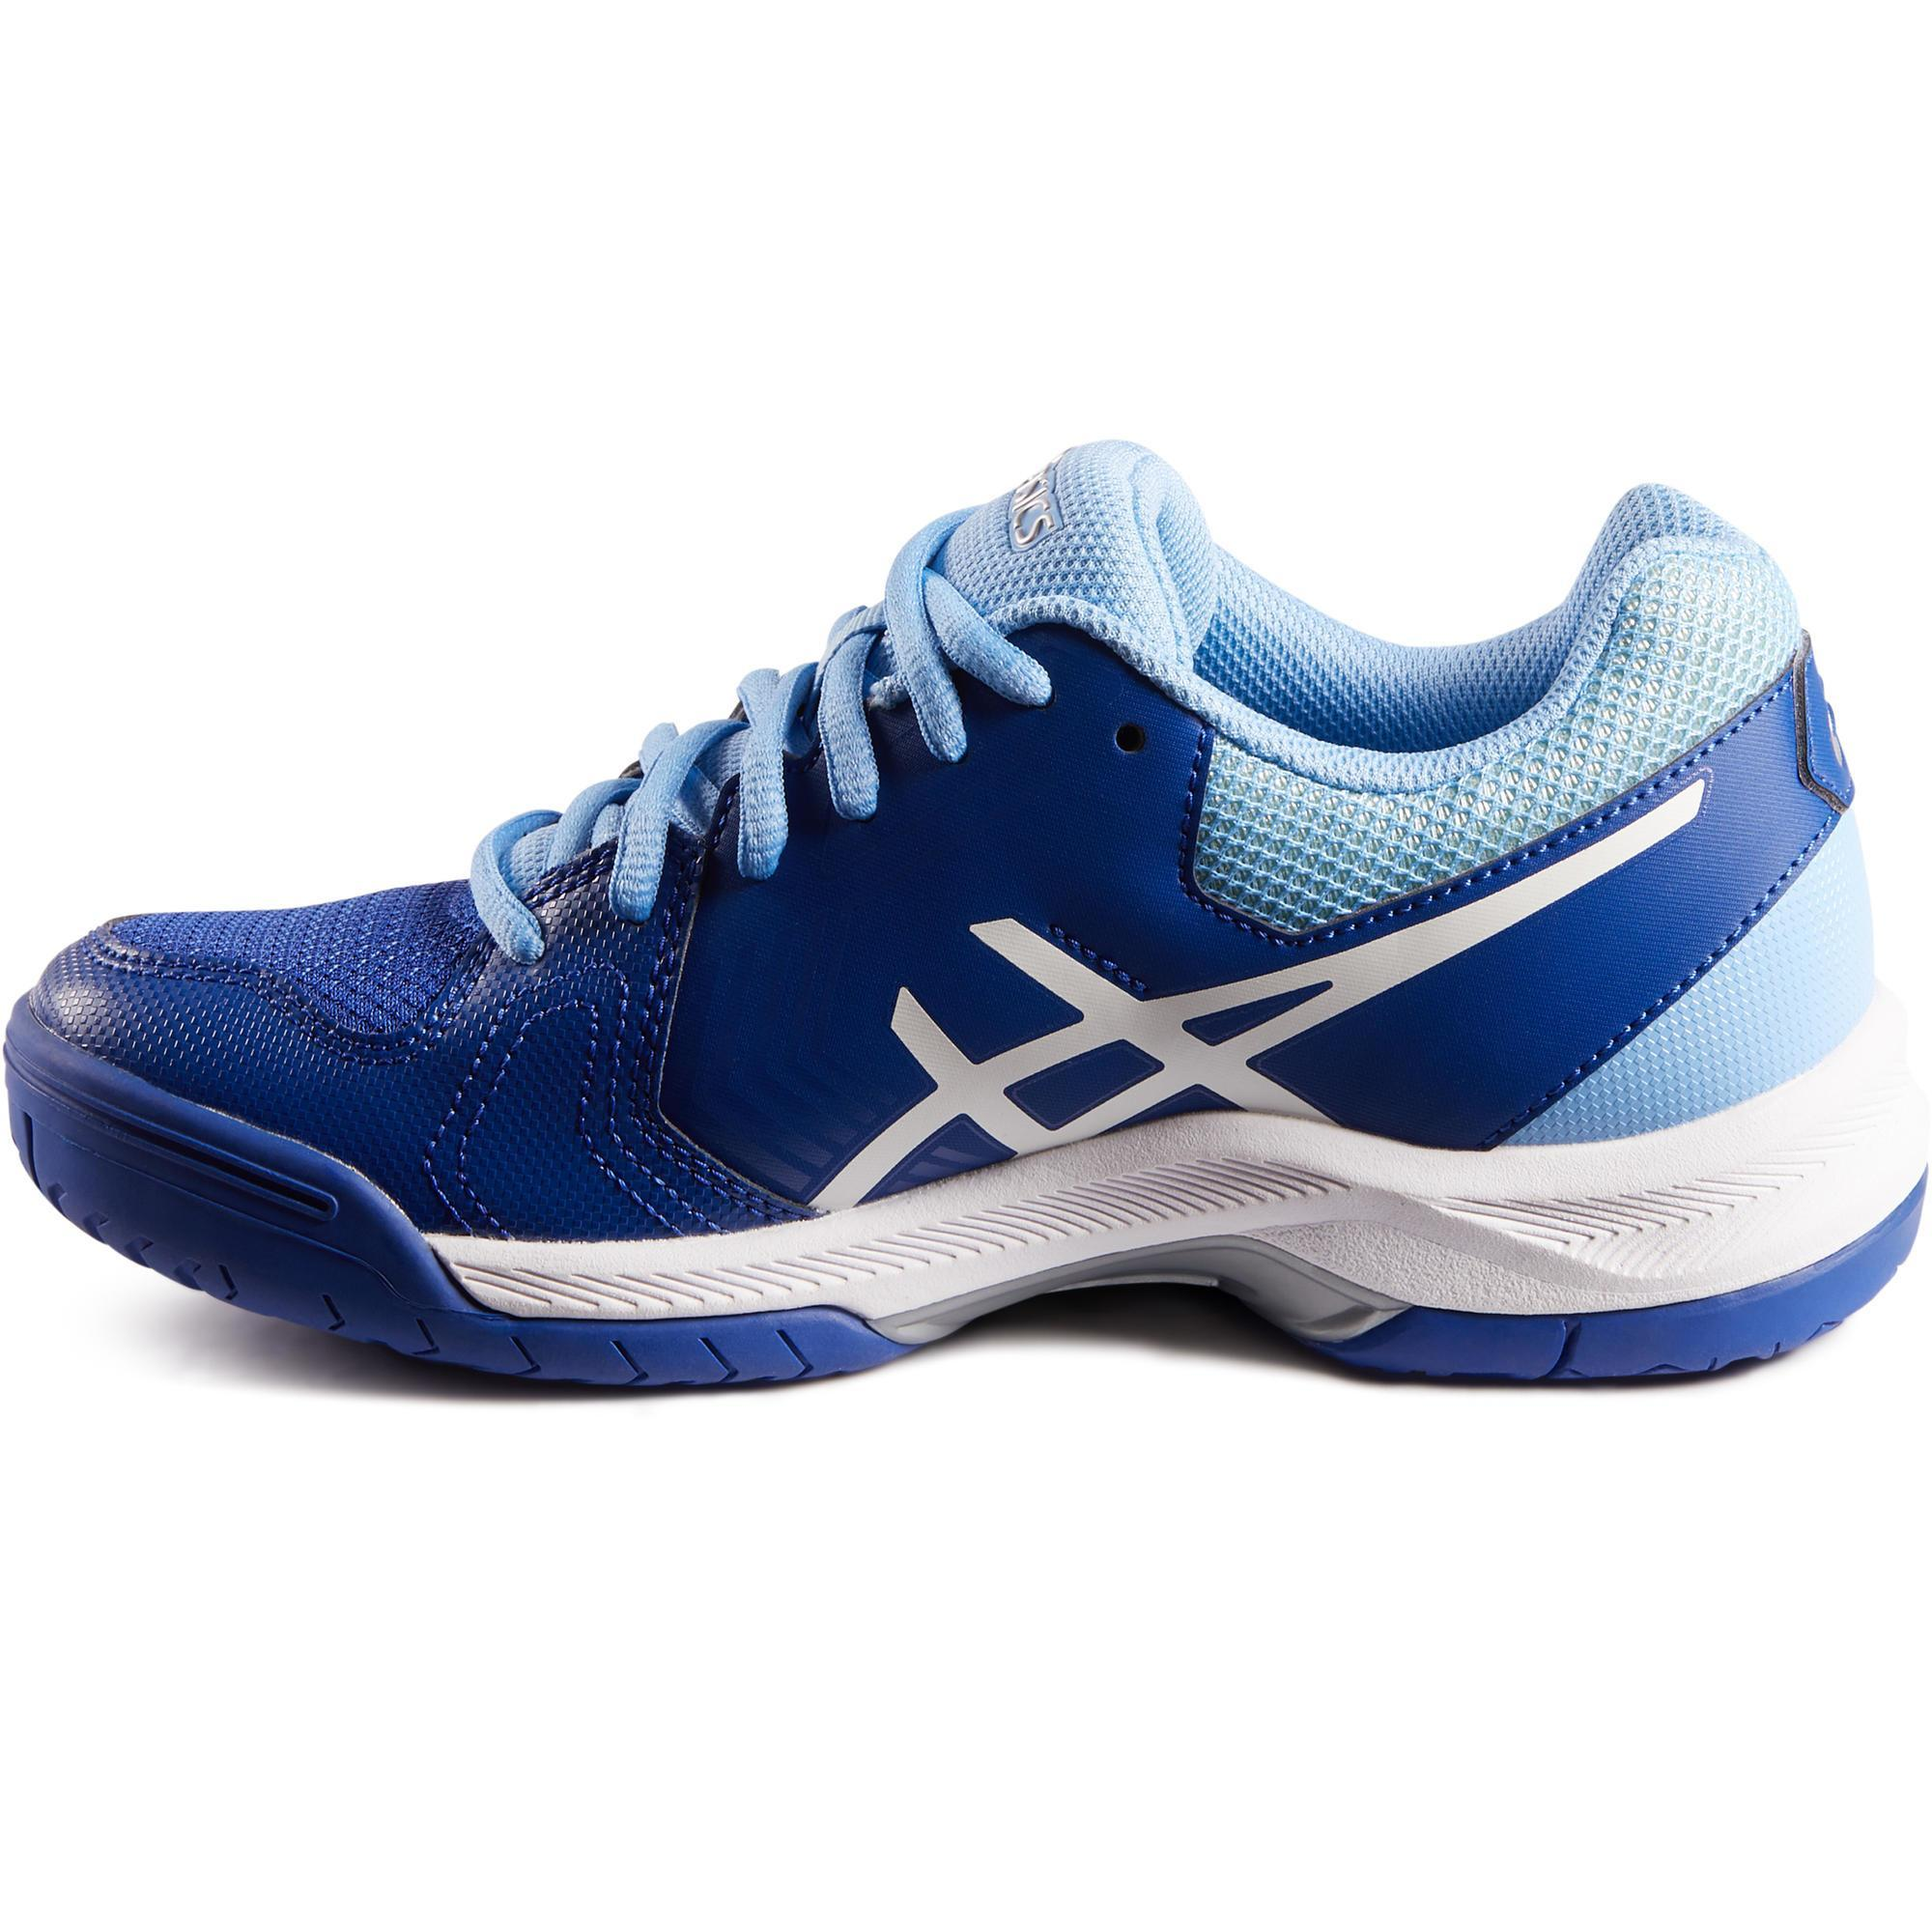 low priced 91a05 0e4fc Chaussure Tennis Asics Femme Dedicate Bleue De Gel Decathlon T6pnpqOdwW